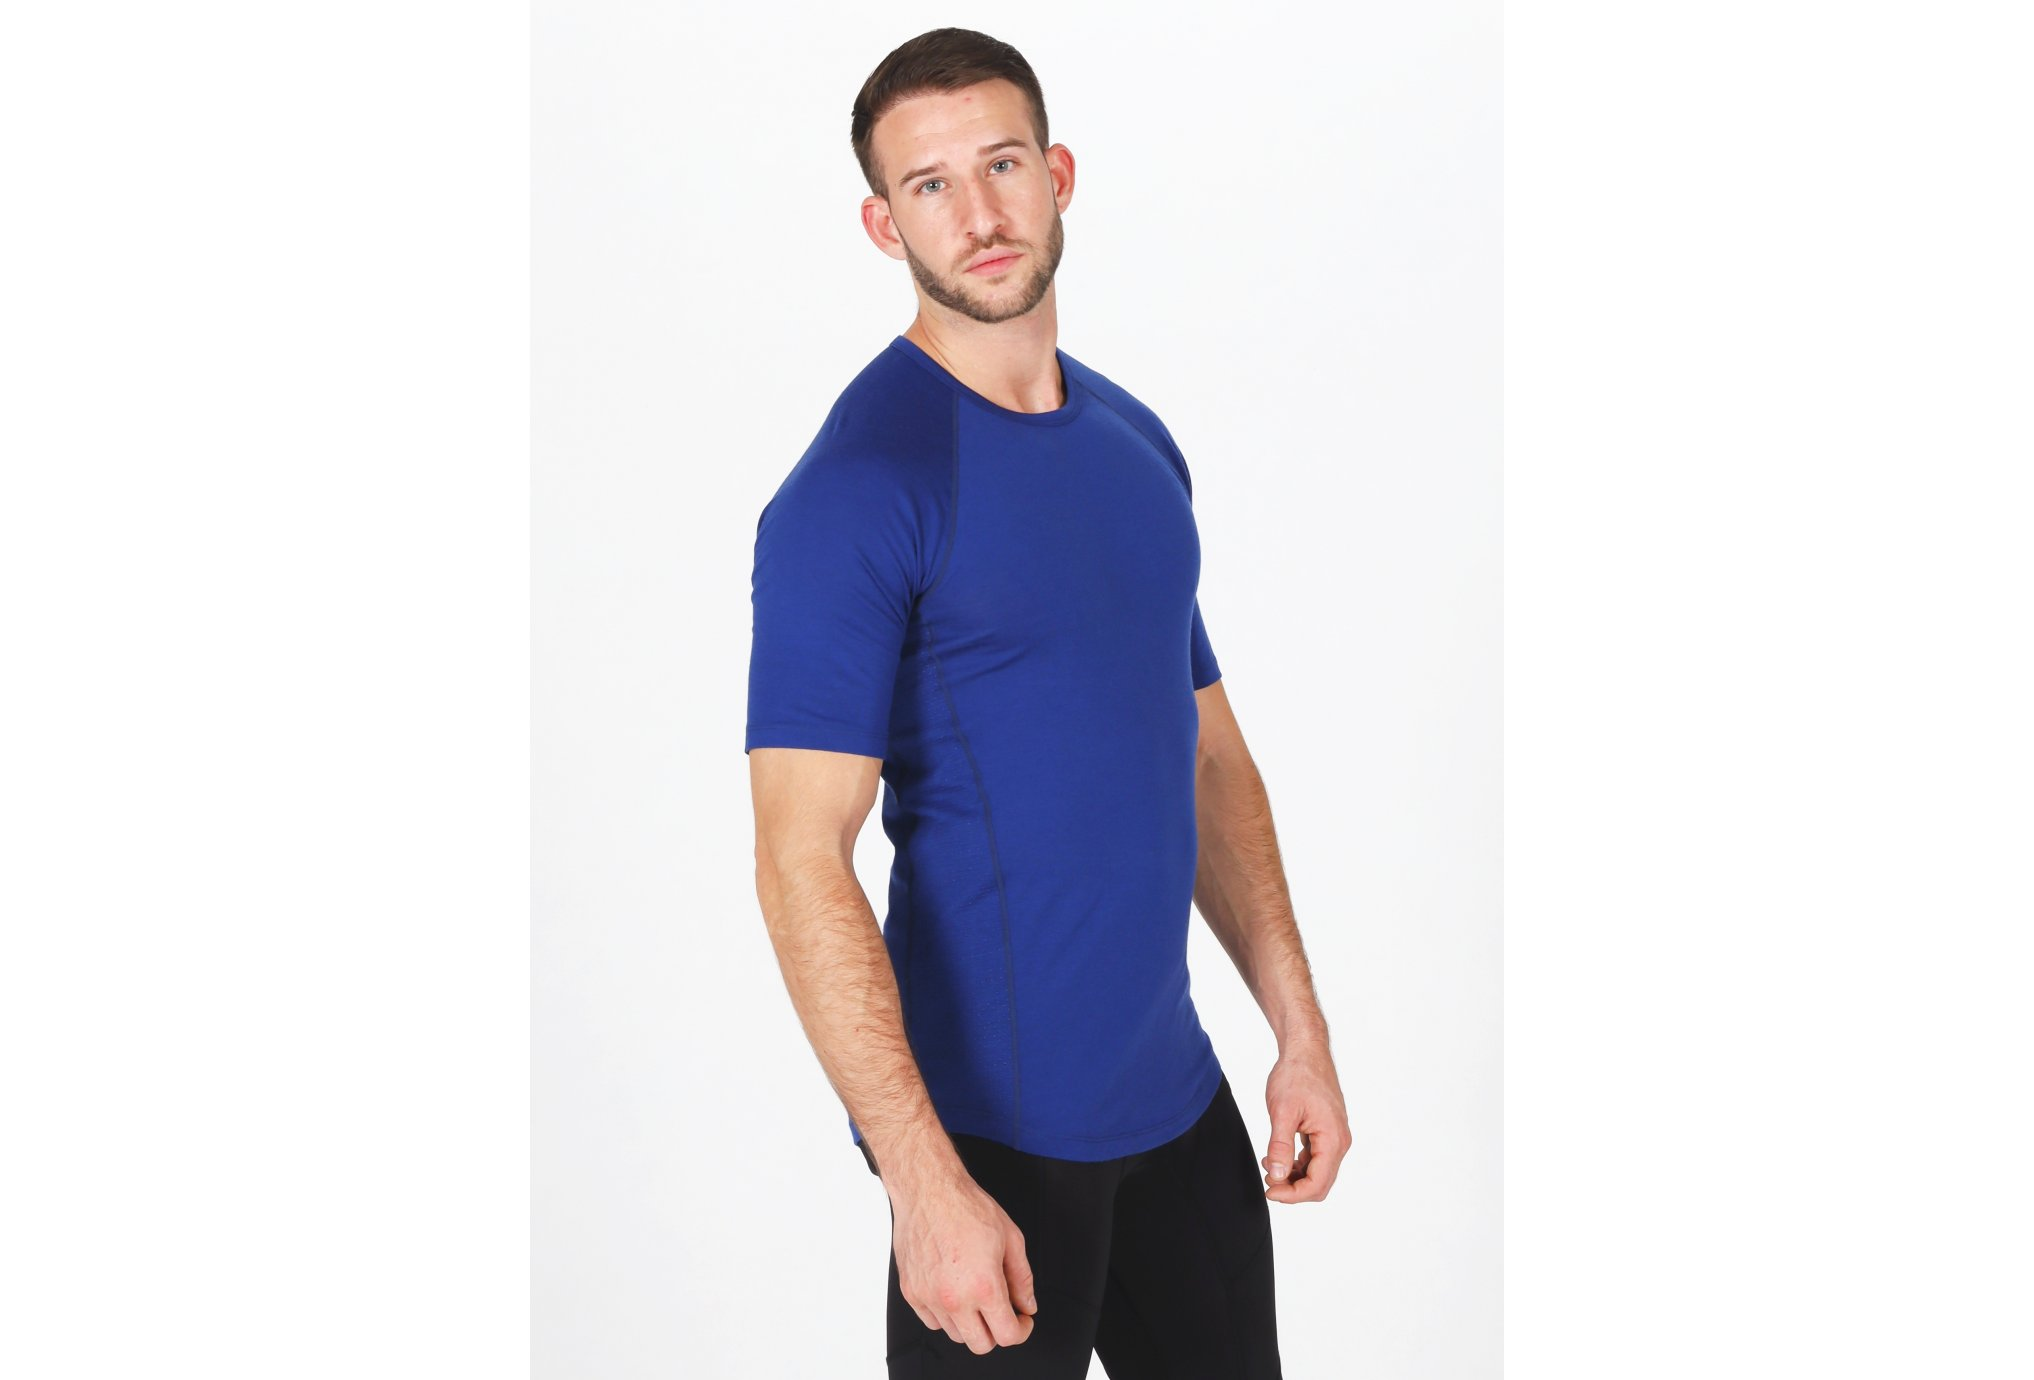 Icebreaker Bodyfitzone 150 M Diététique Vêtements homme